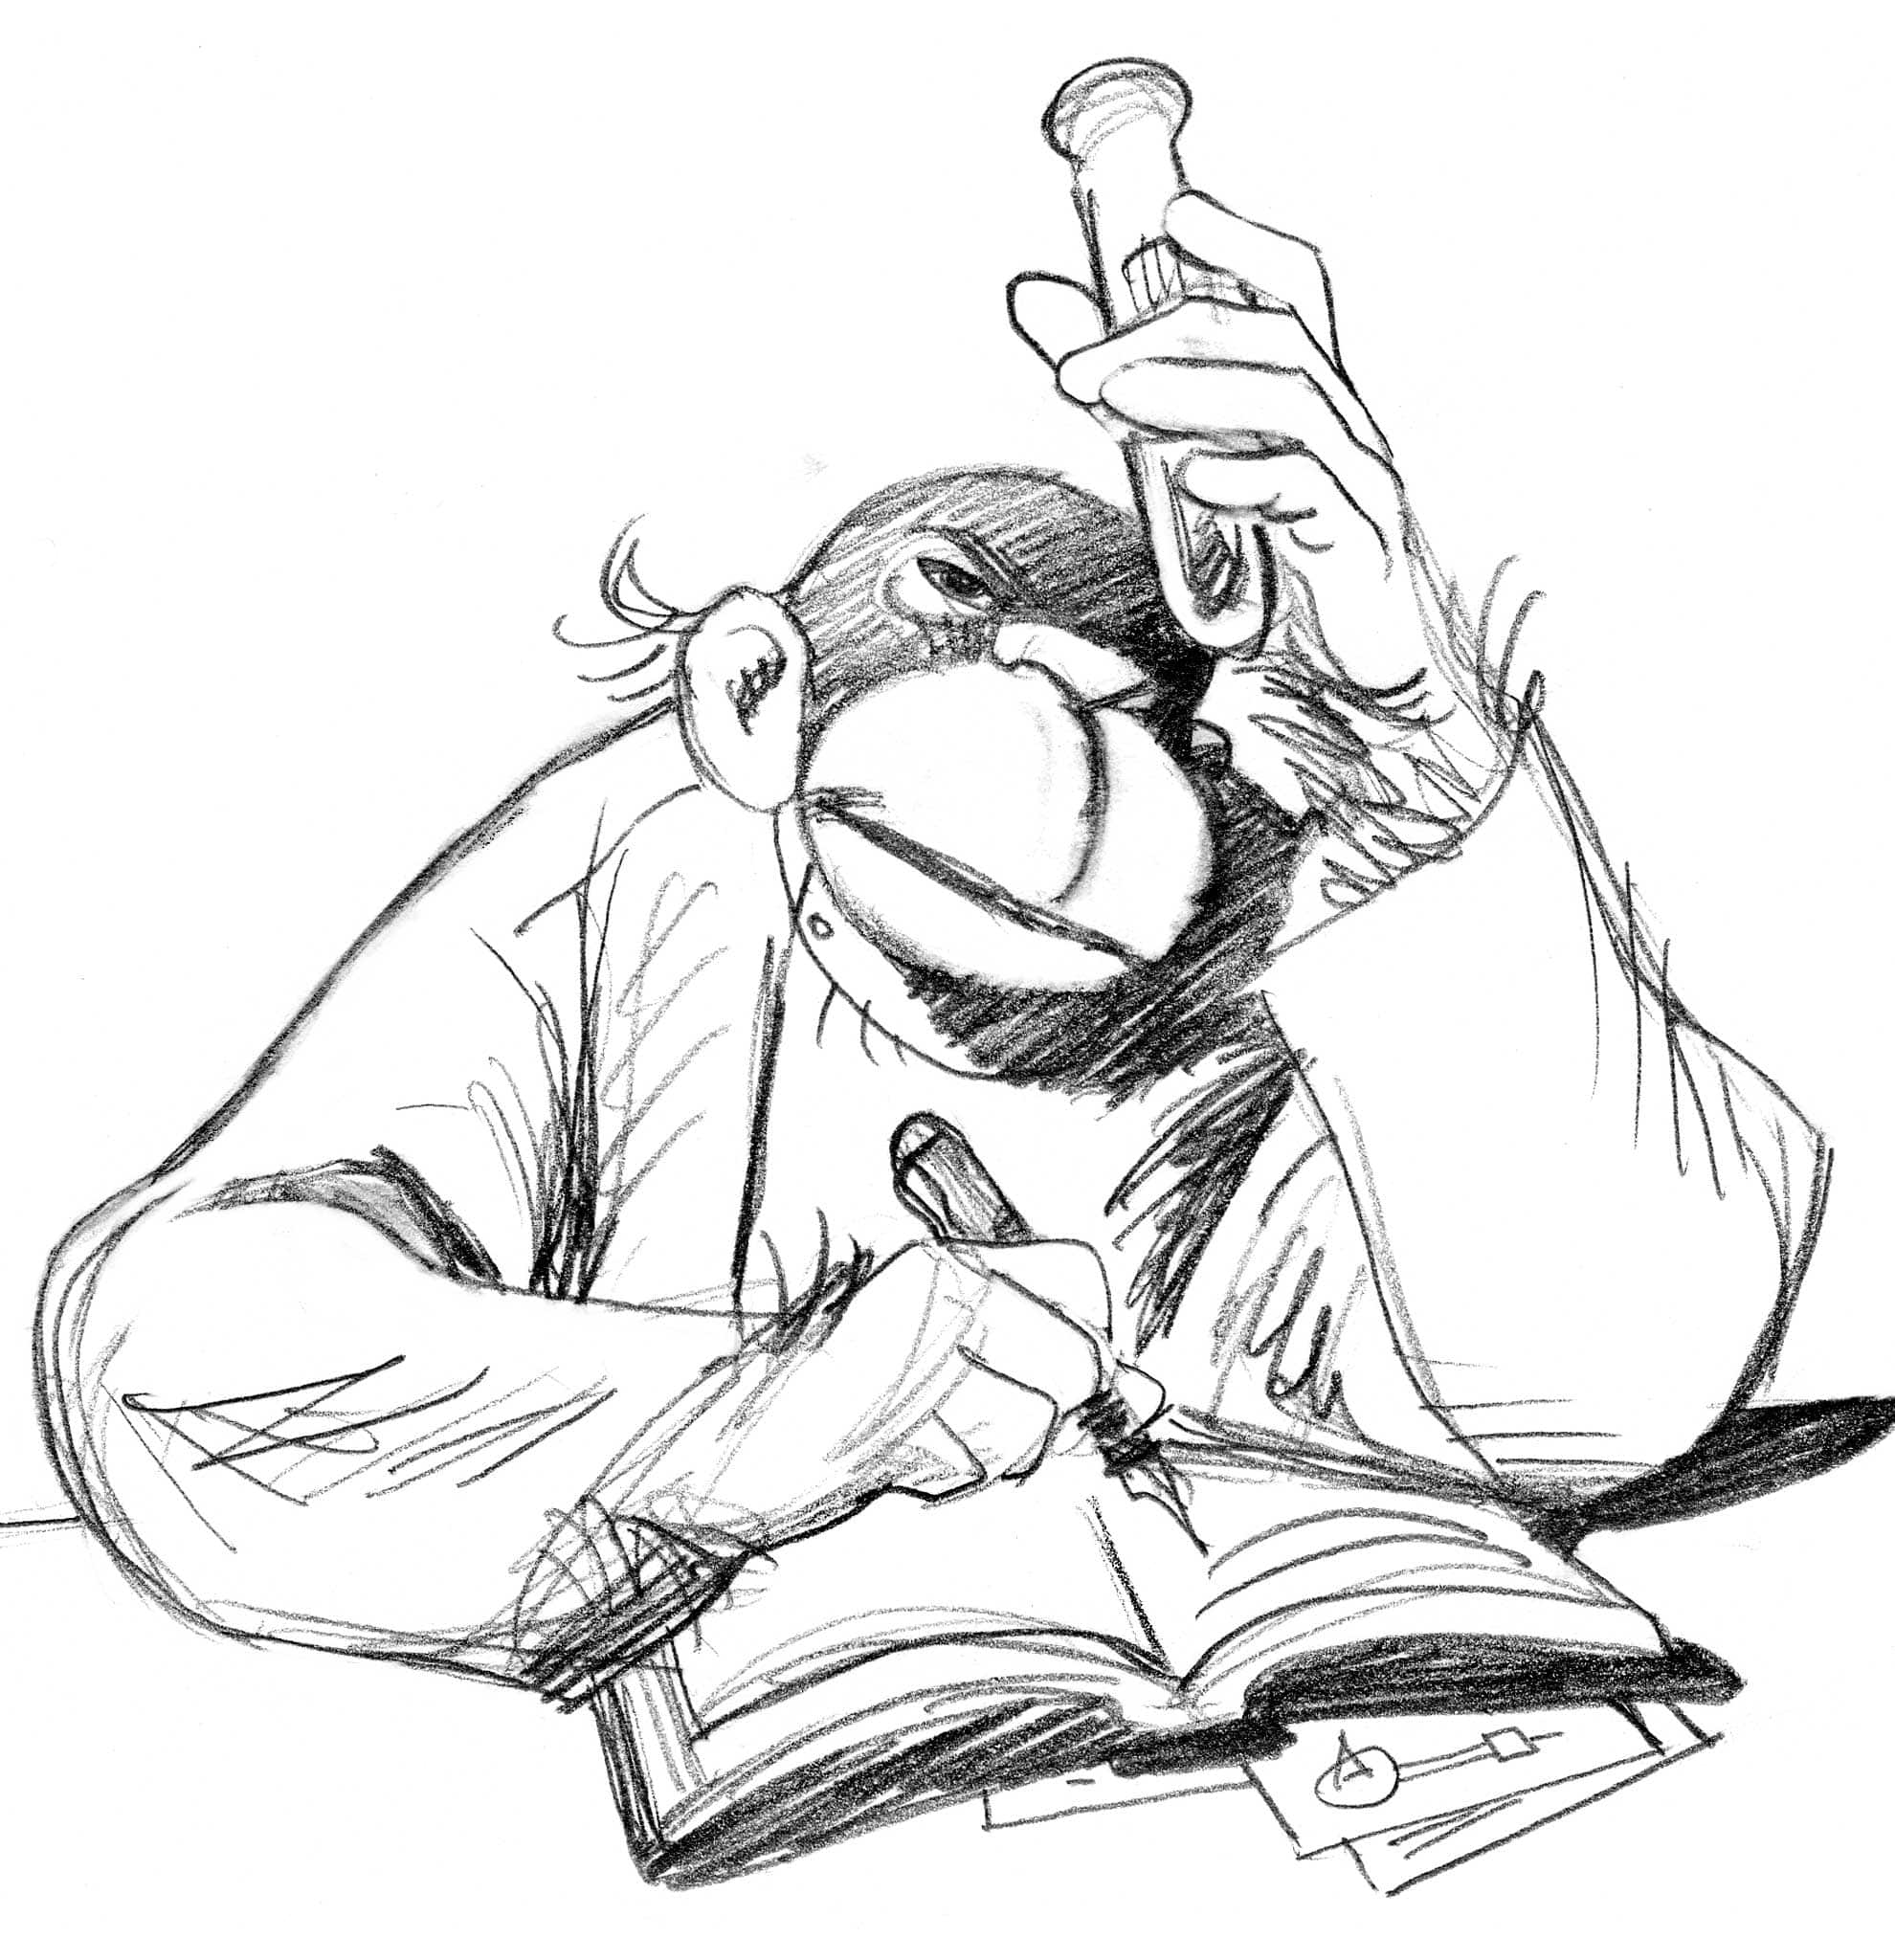 KH2900J-battle-monkeys-chimp-scientist